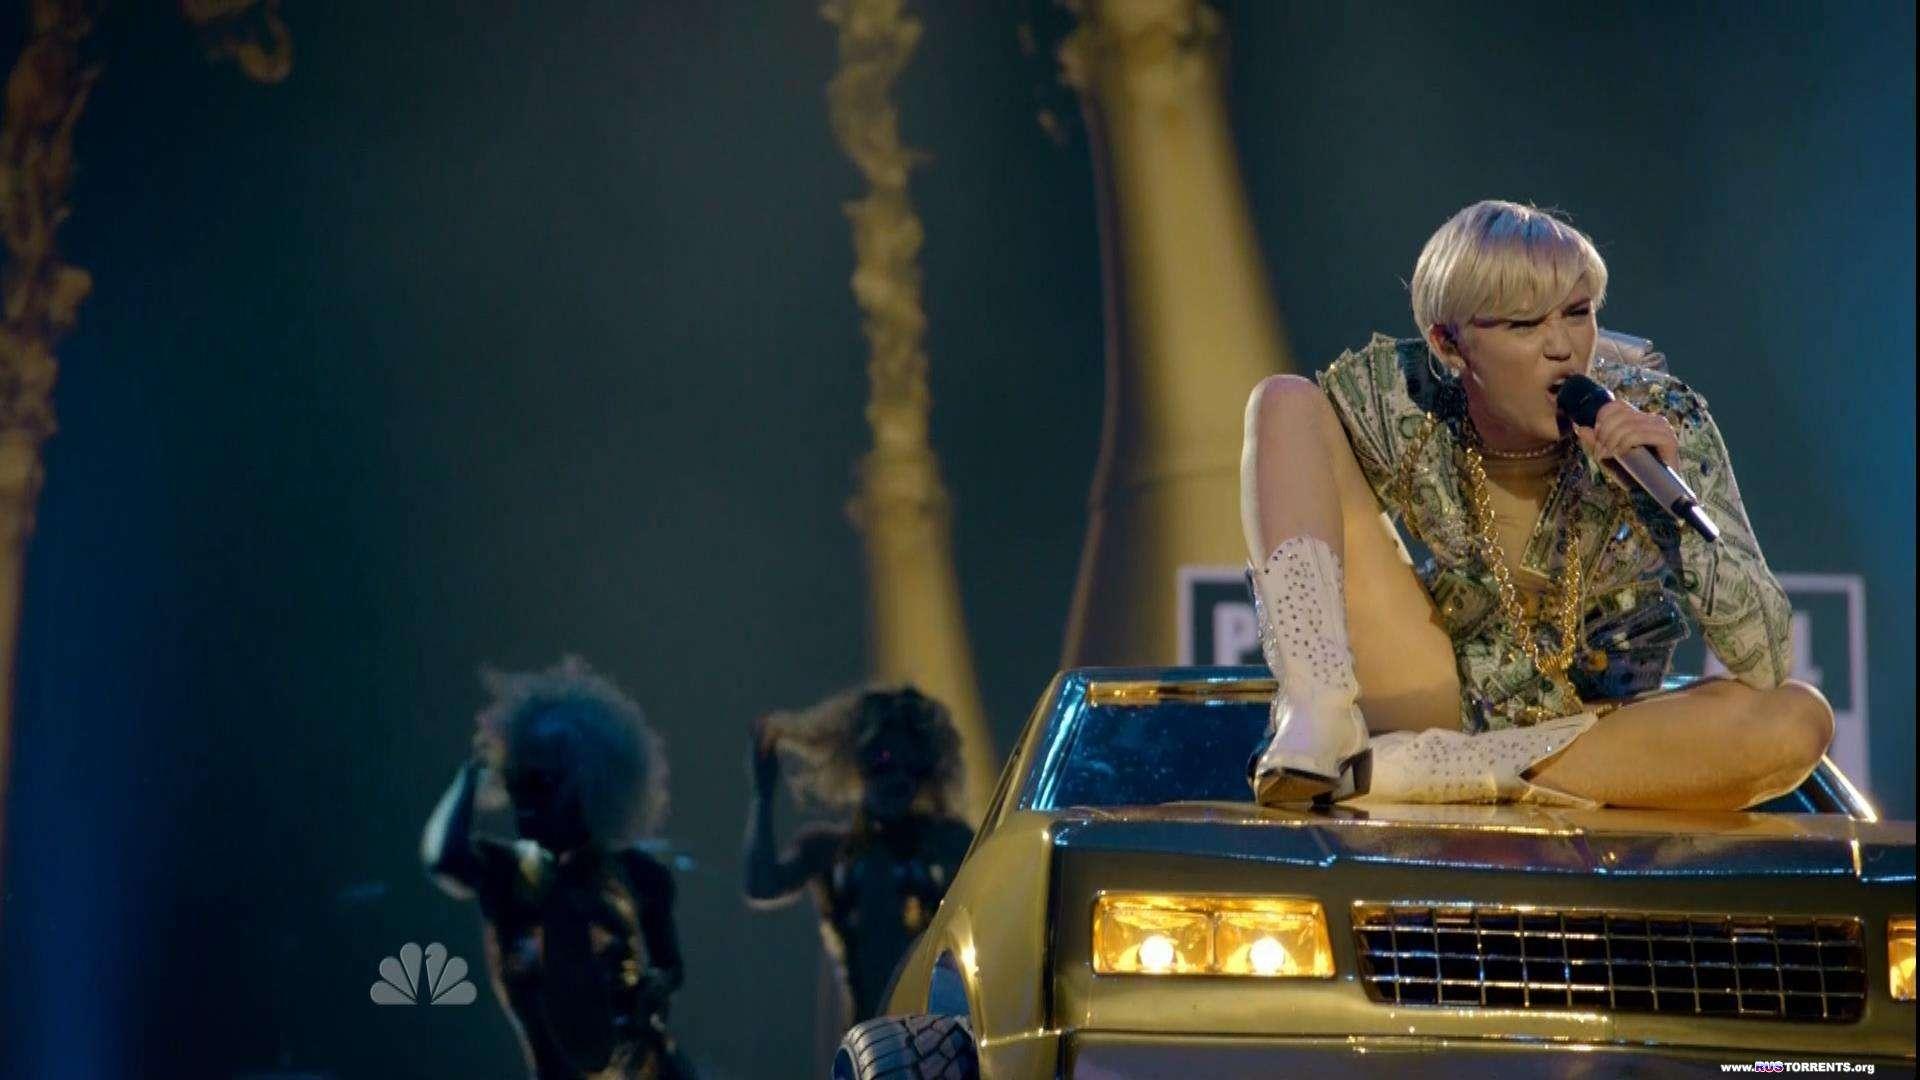 Miley Cyrus - Bangerz Tour | HDTV 1080i